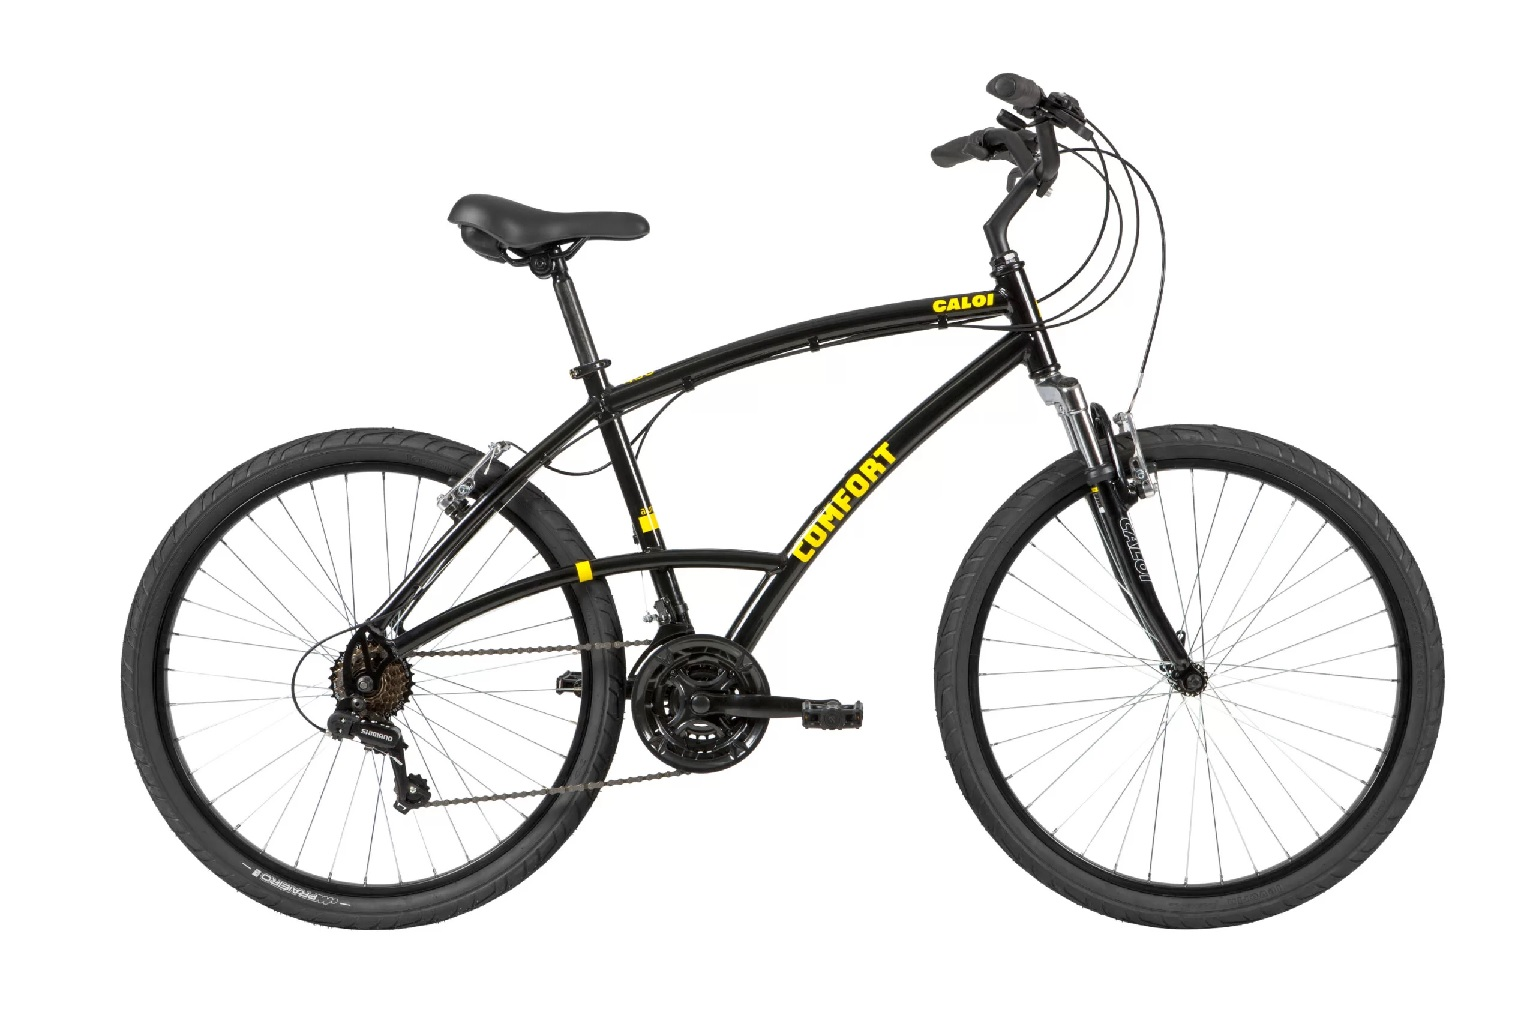 Bicicleta Caloi 400 -  Masculina 2021 - Preto / Amarela